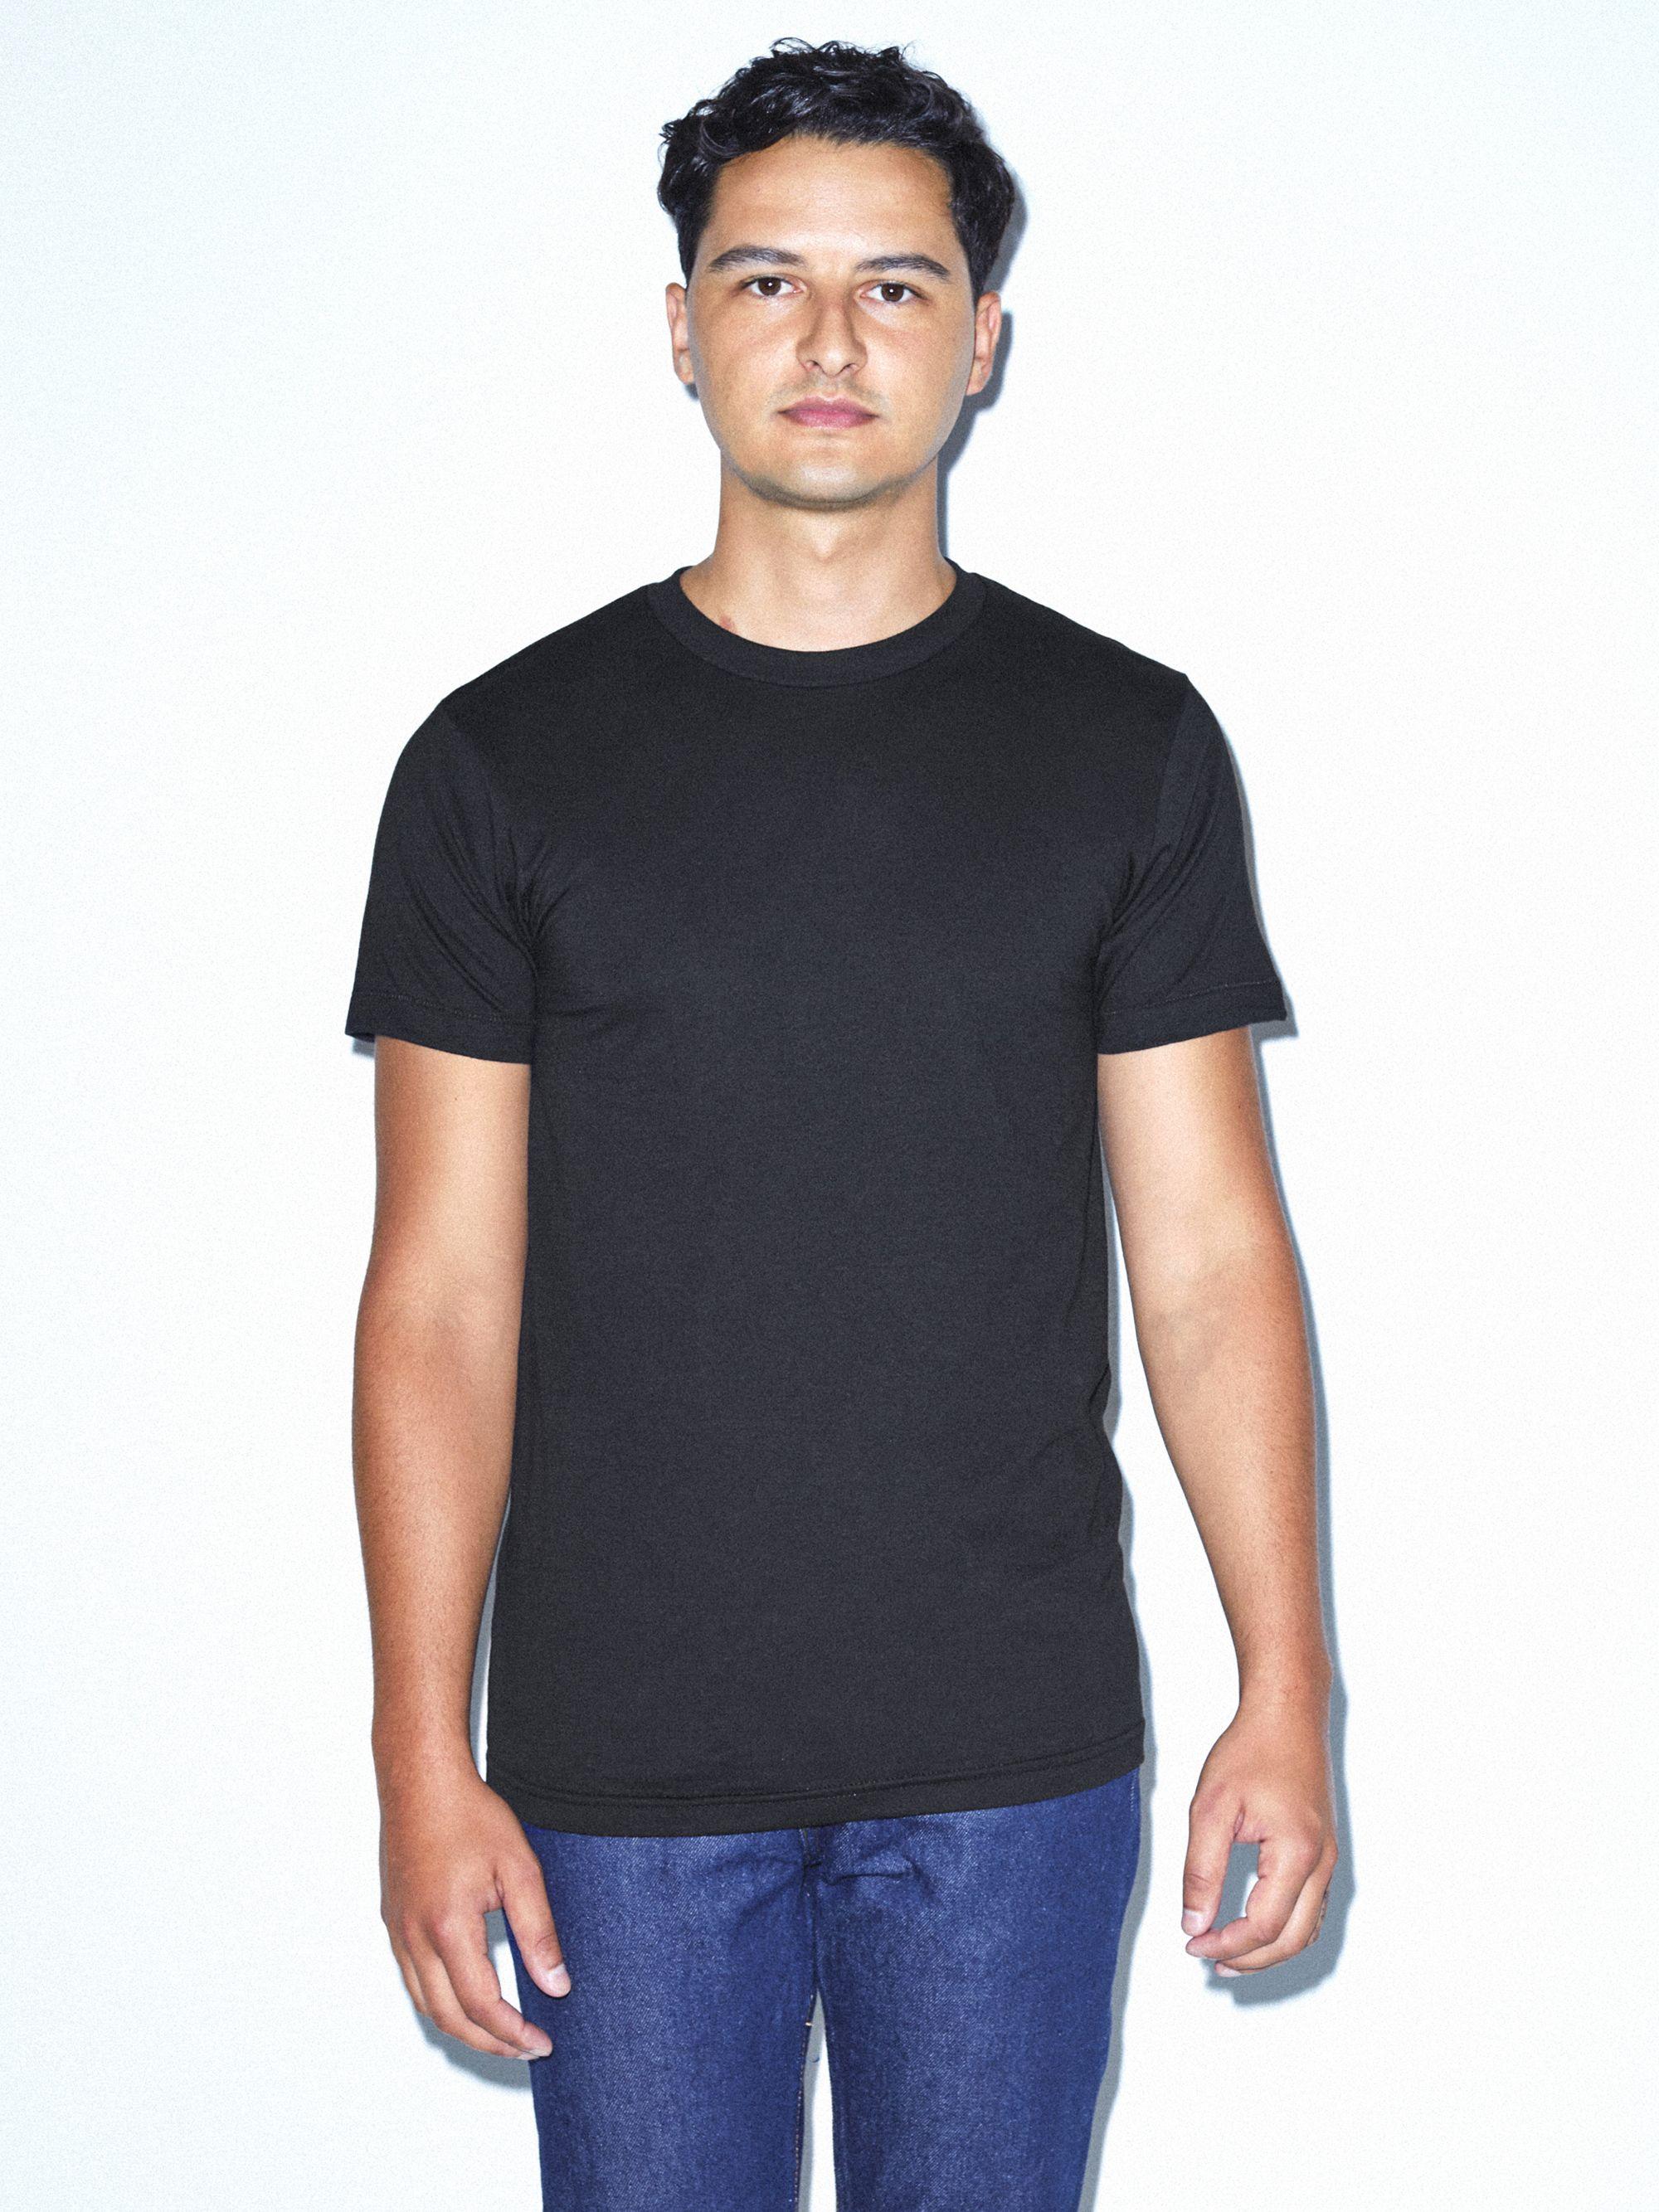 aaeee66e2 50/50 Crewneck T-Shirt | American Apparel